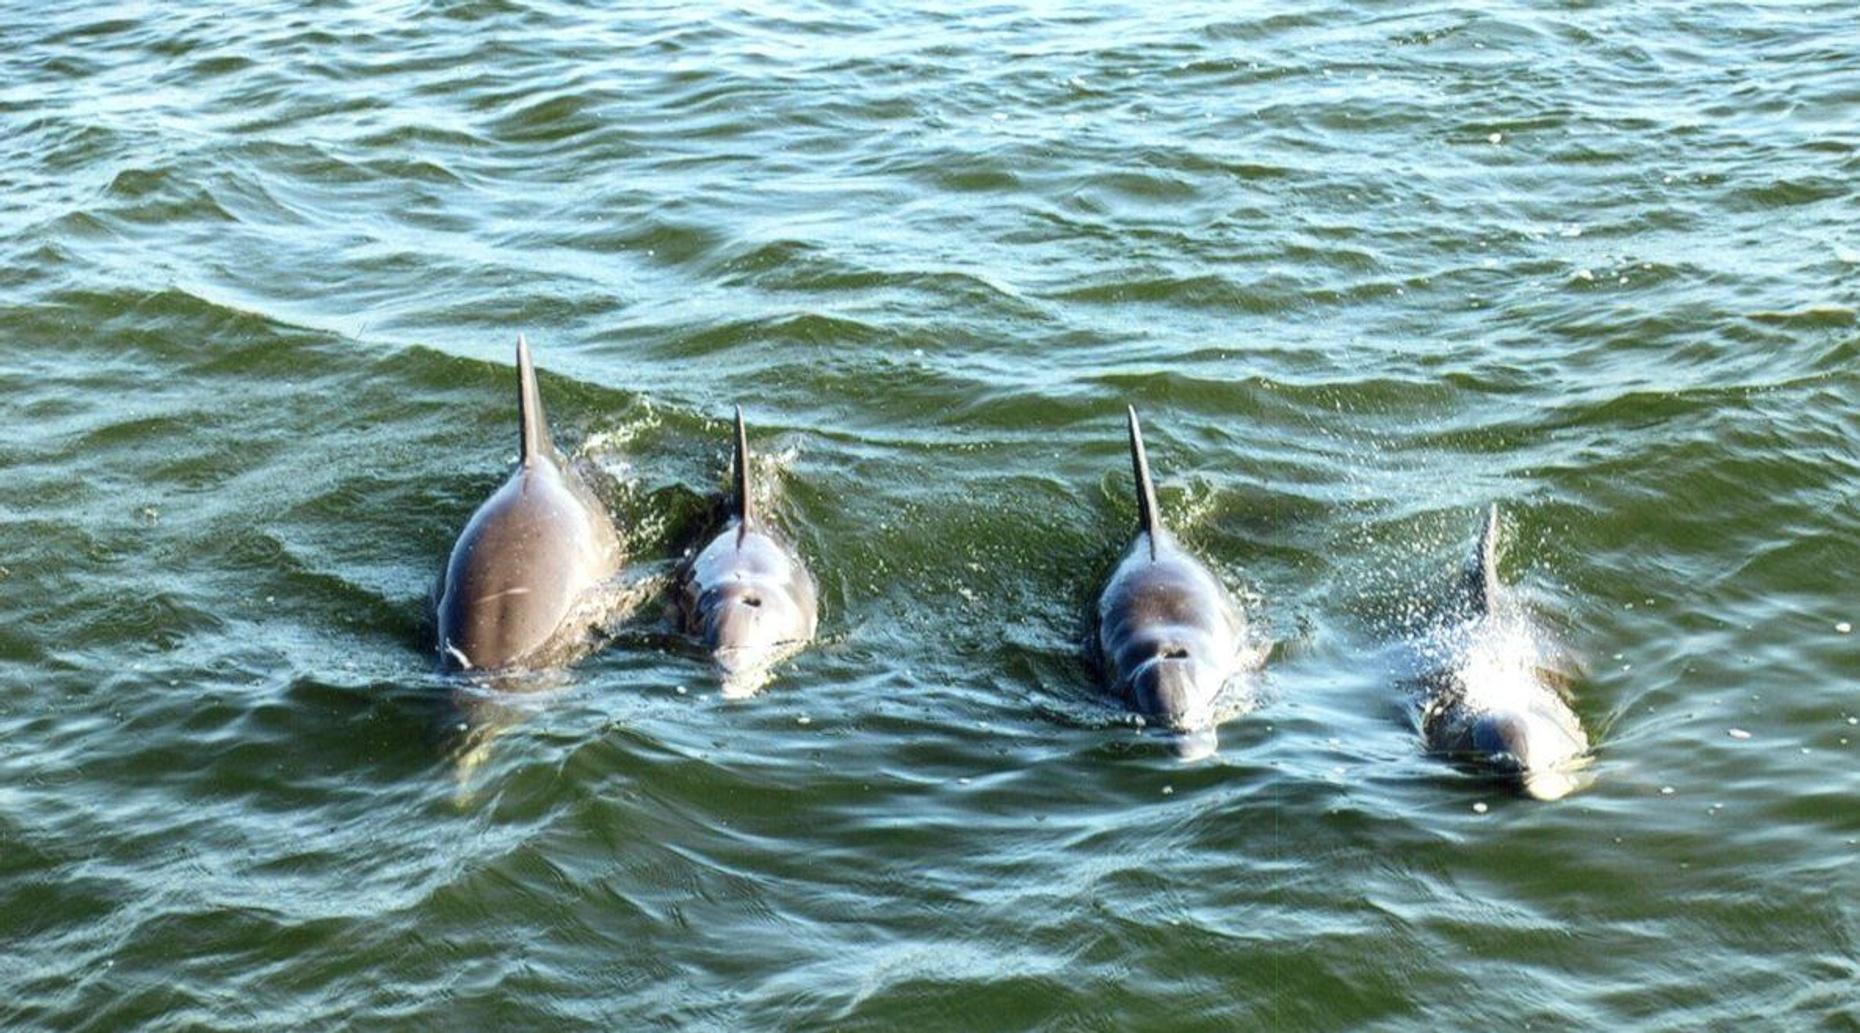 St. Petersburg Dolphin Cruise